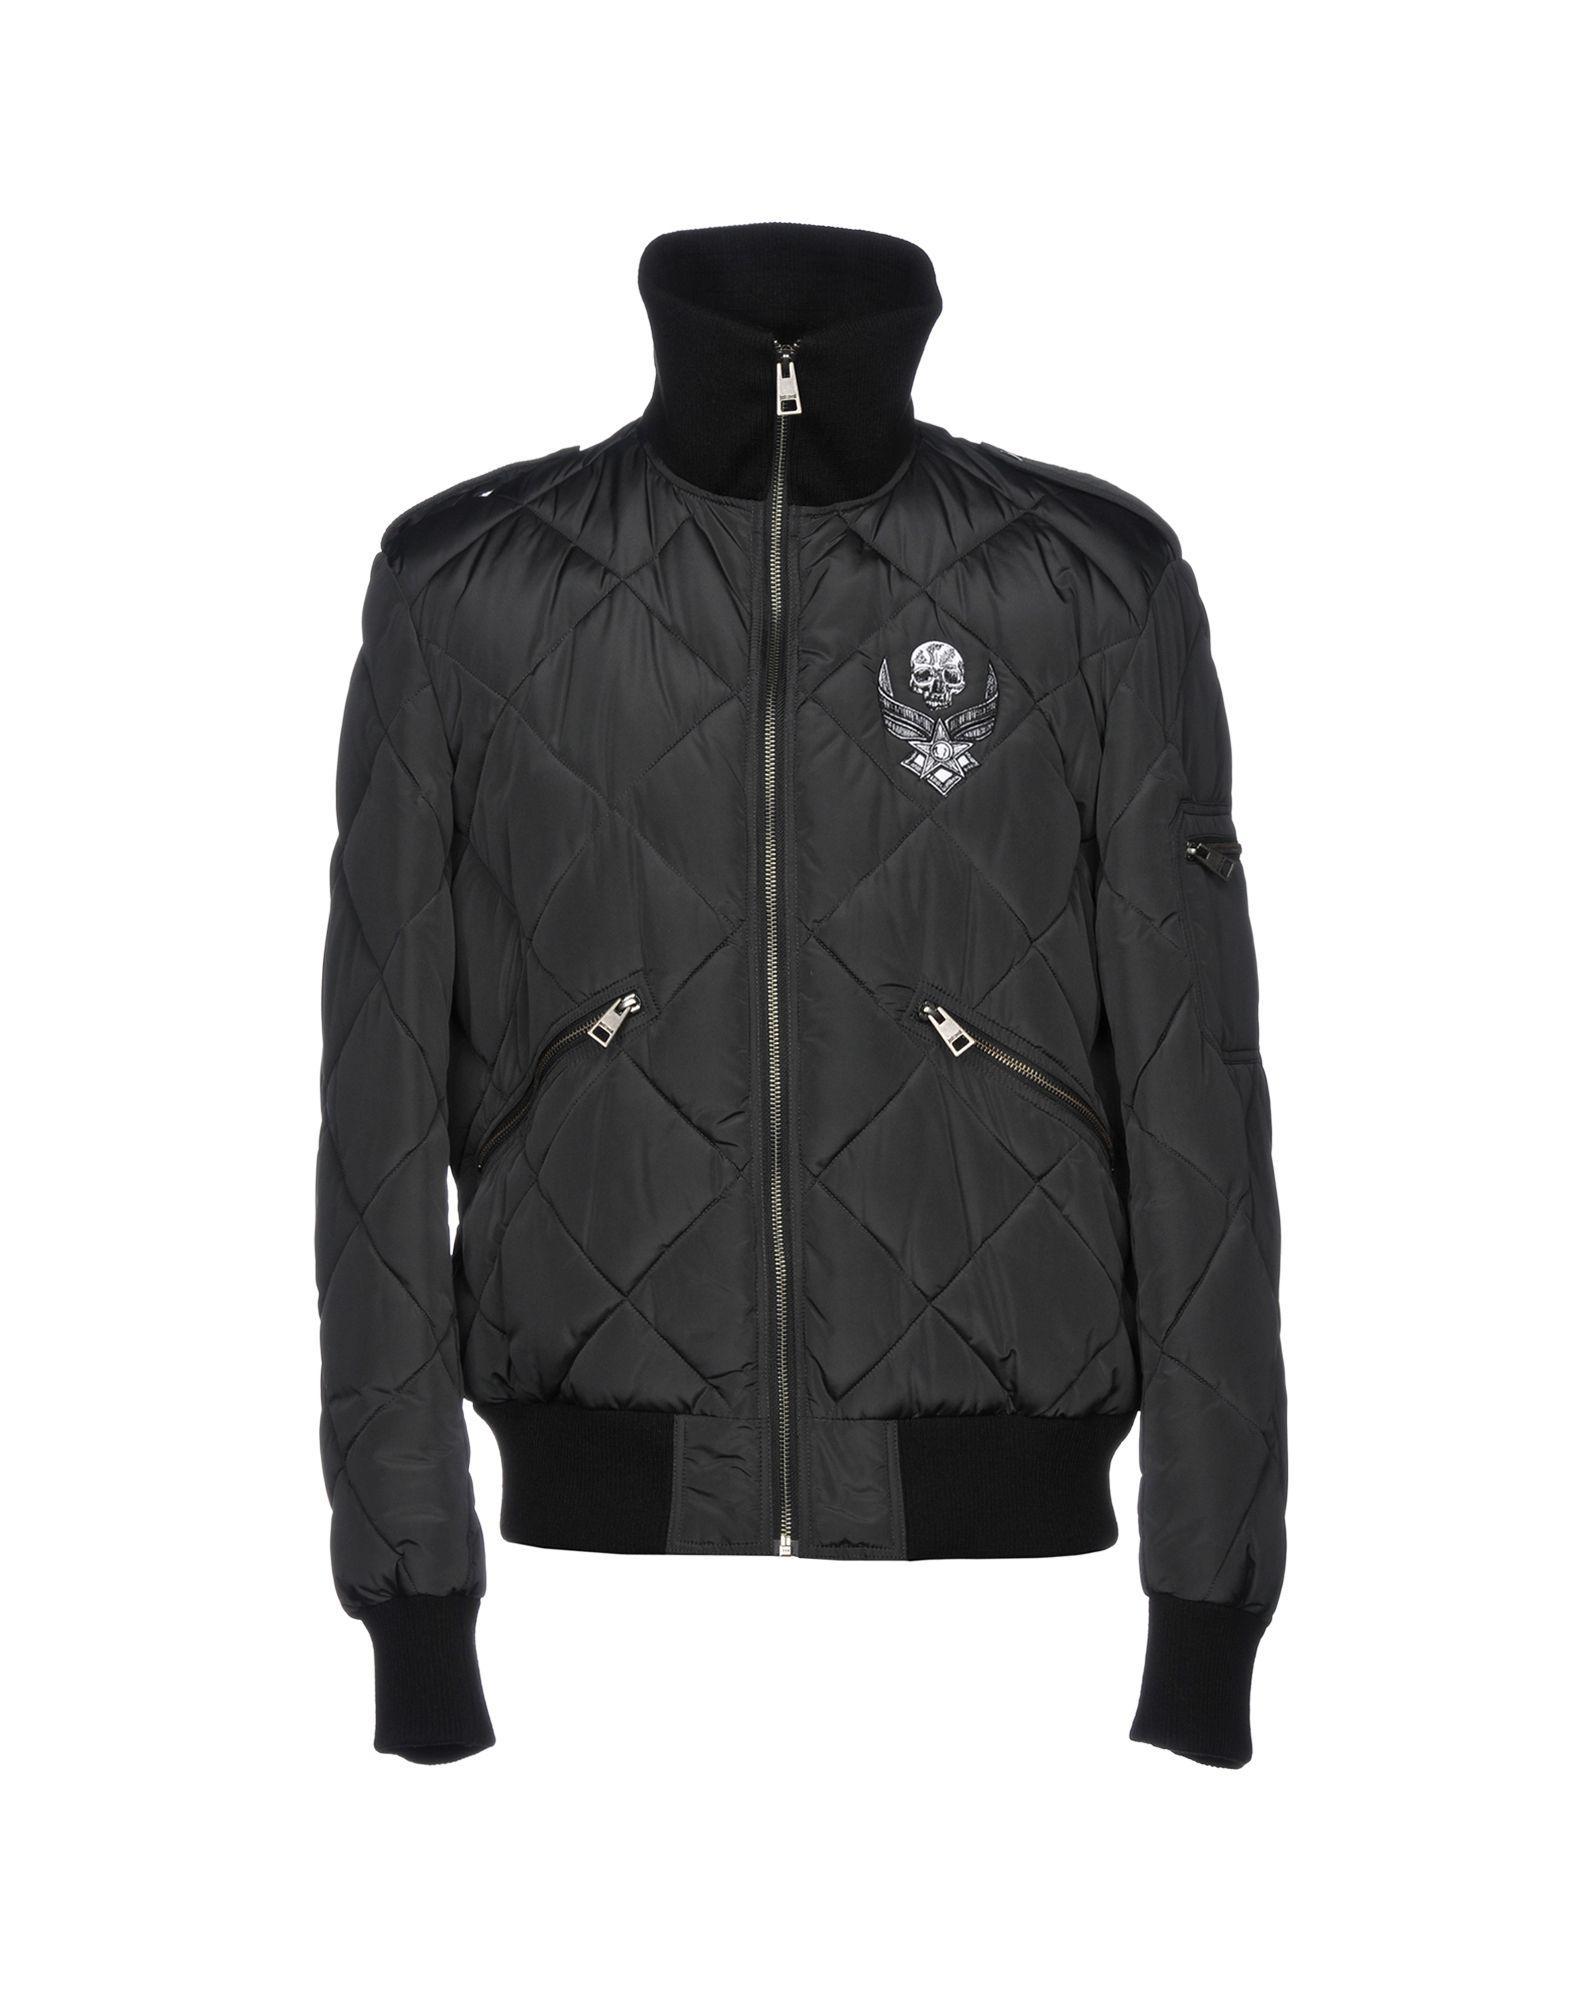 Just Cavalli Jackets In Black